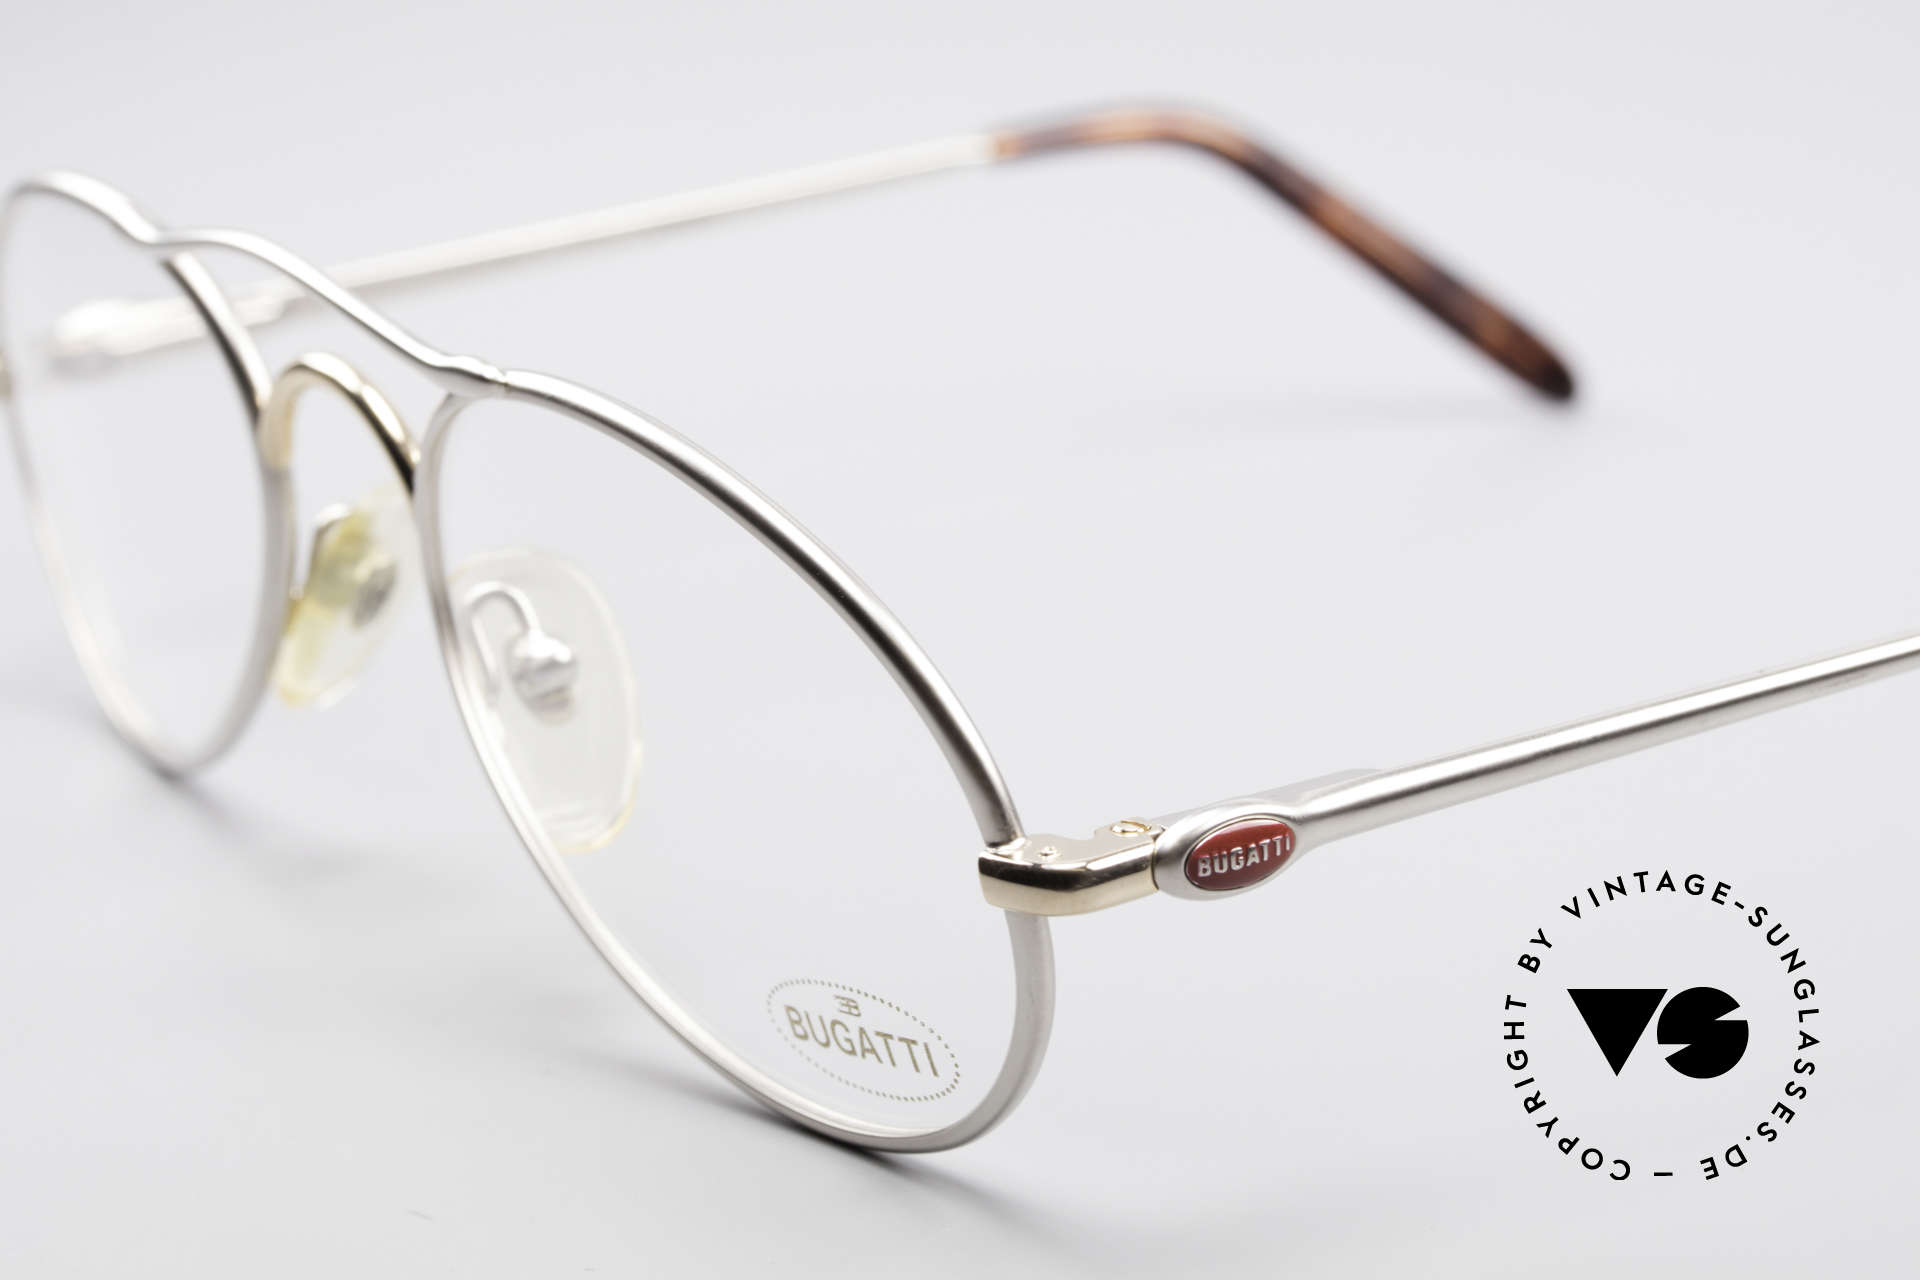 Bugatti 23439 90's Luxury Glasses For Men, unworn (like all our rare vintage Bugatti eyewear), Made for Men